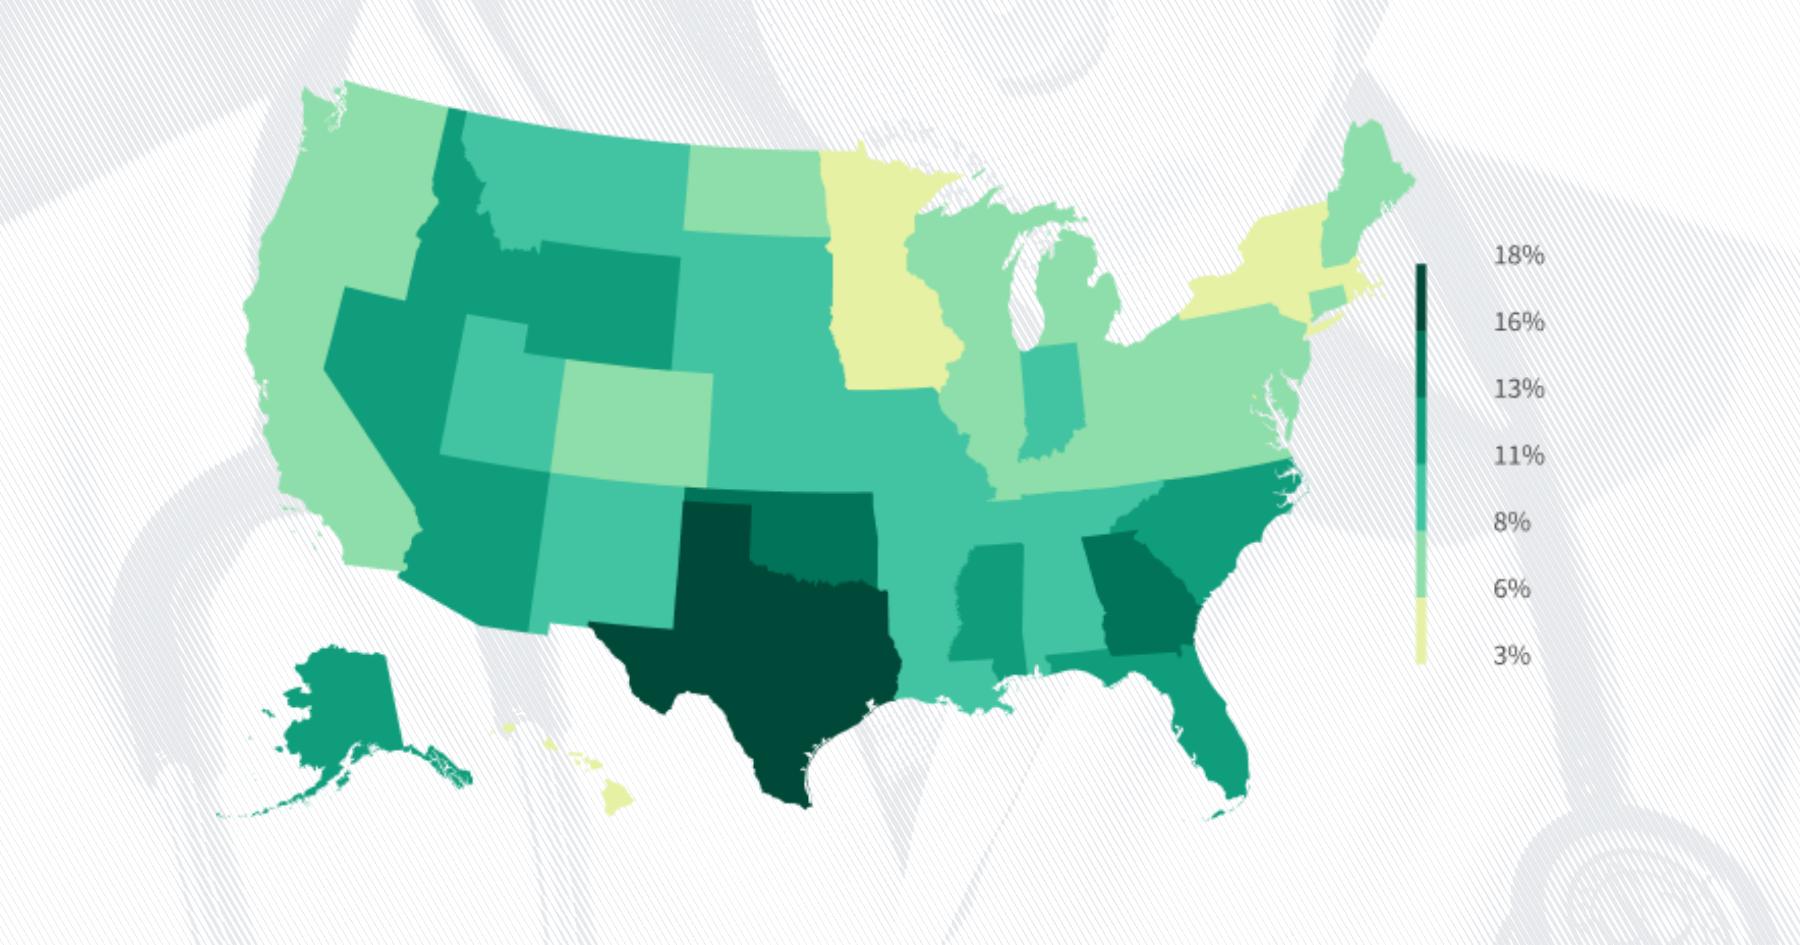 US health insurance coverage data 2019